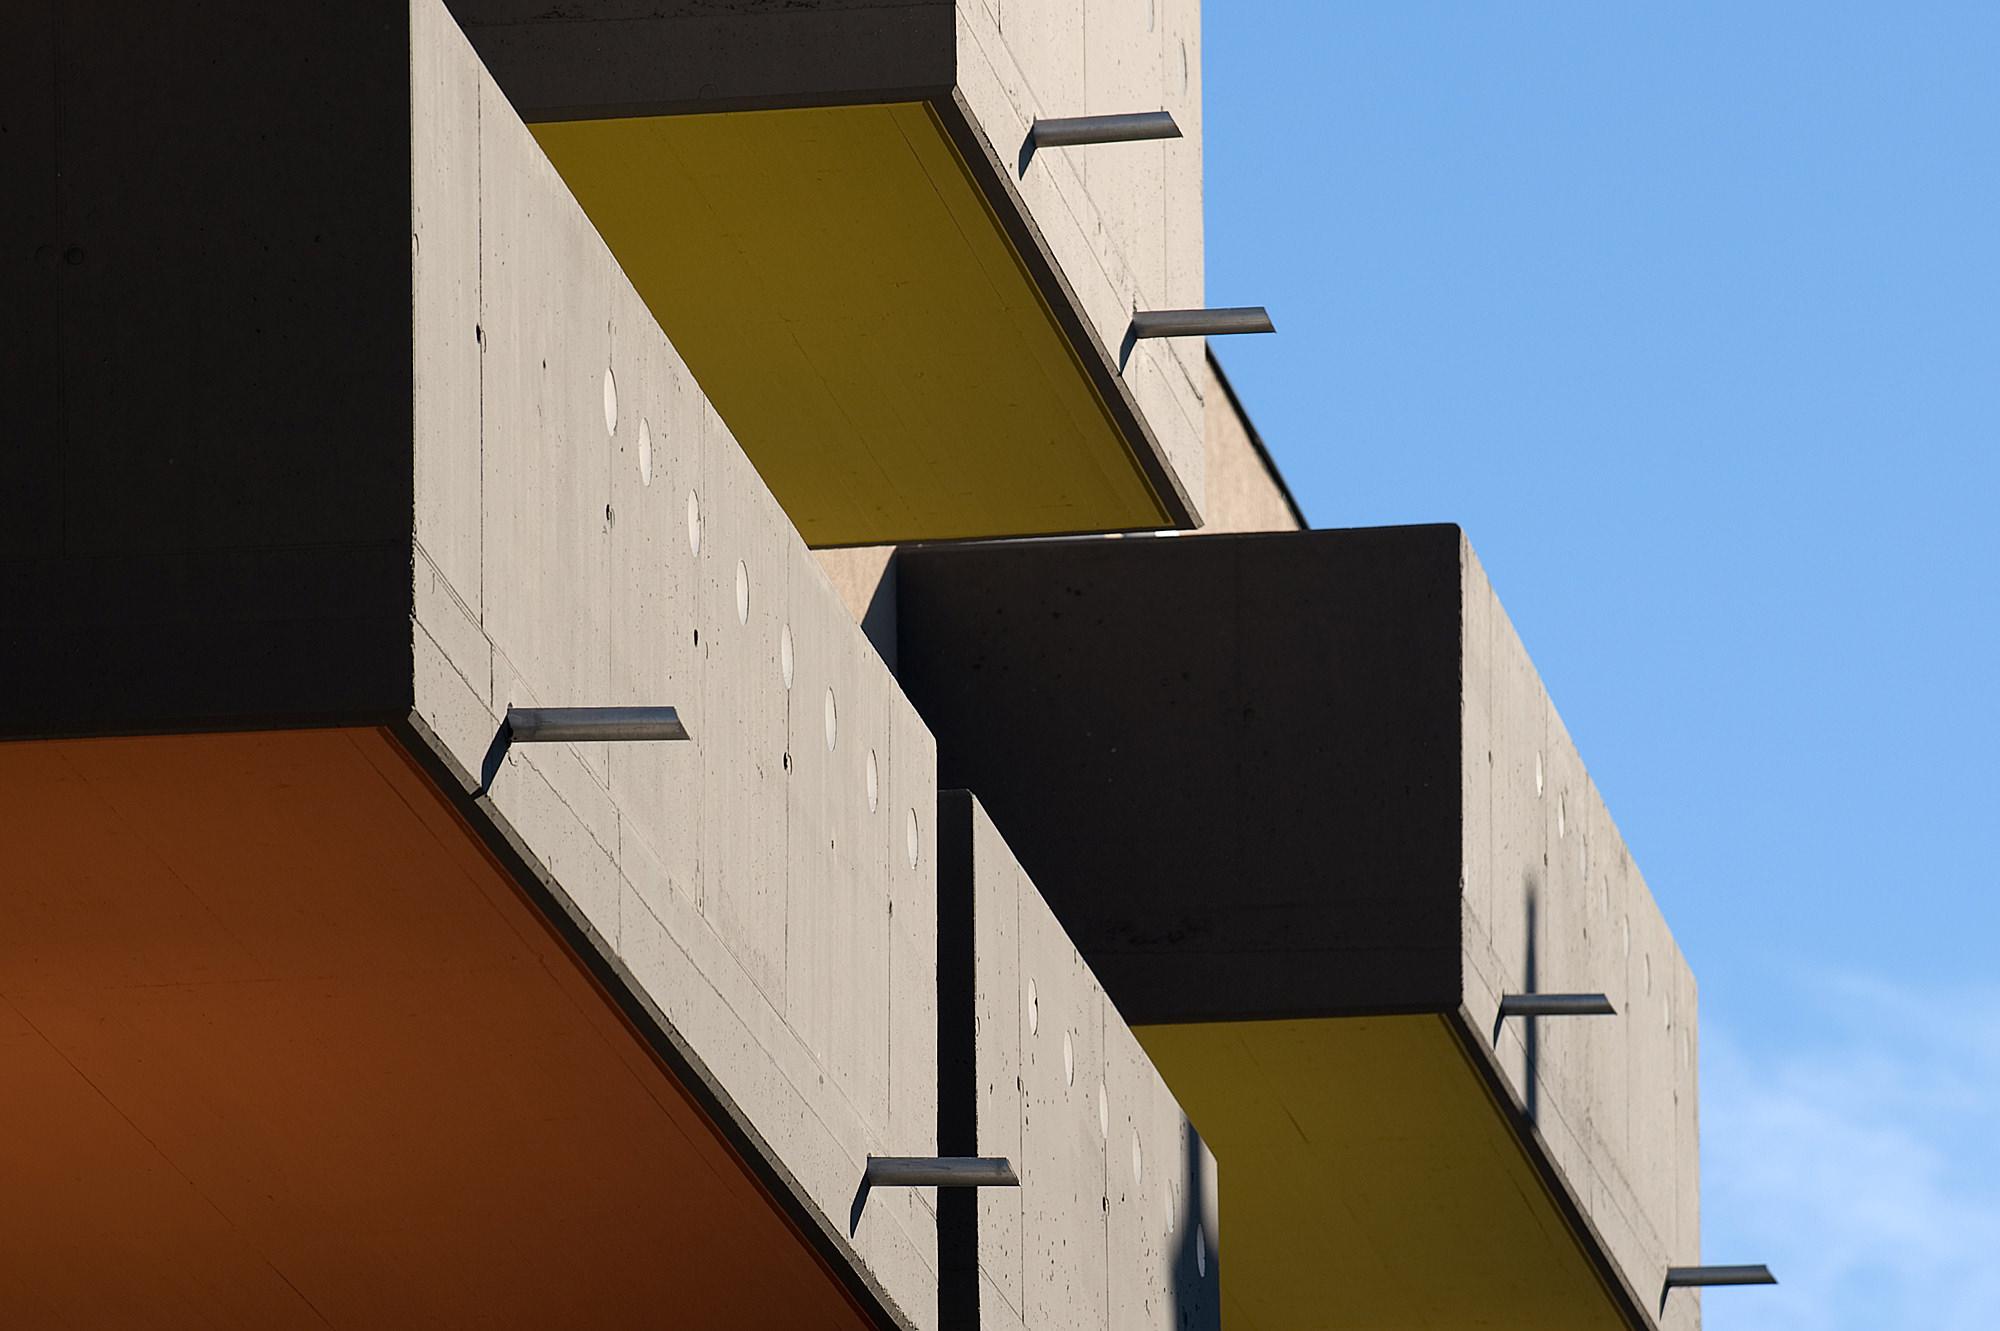 moselgasse_07_wohnbau_1100_wien_junger_beer_architektur